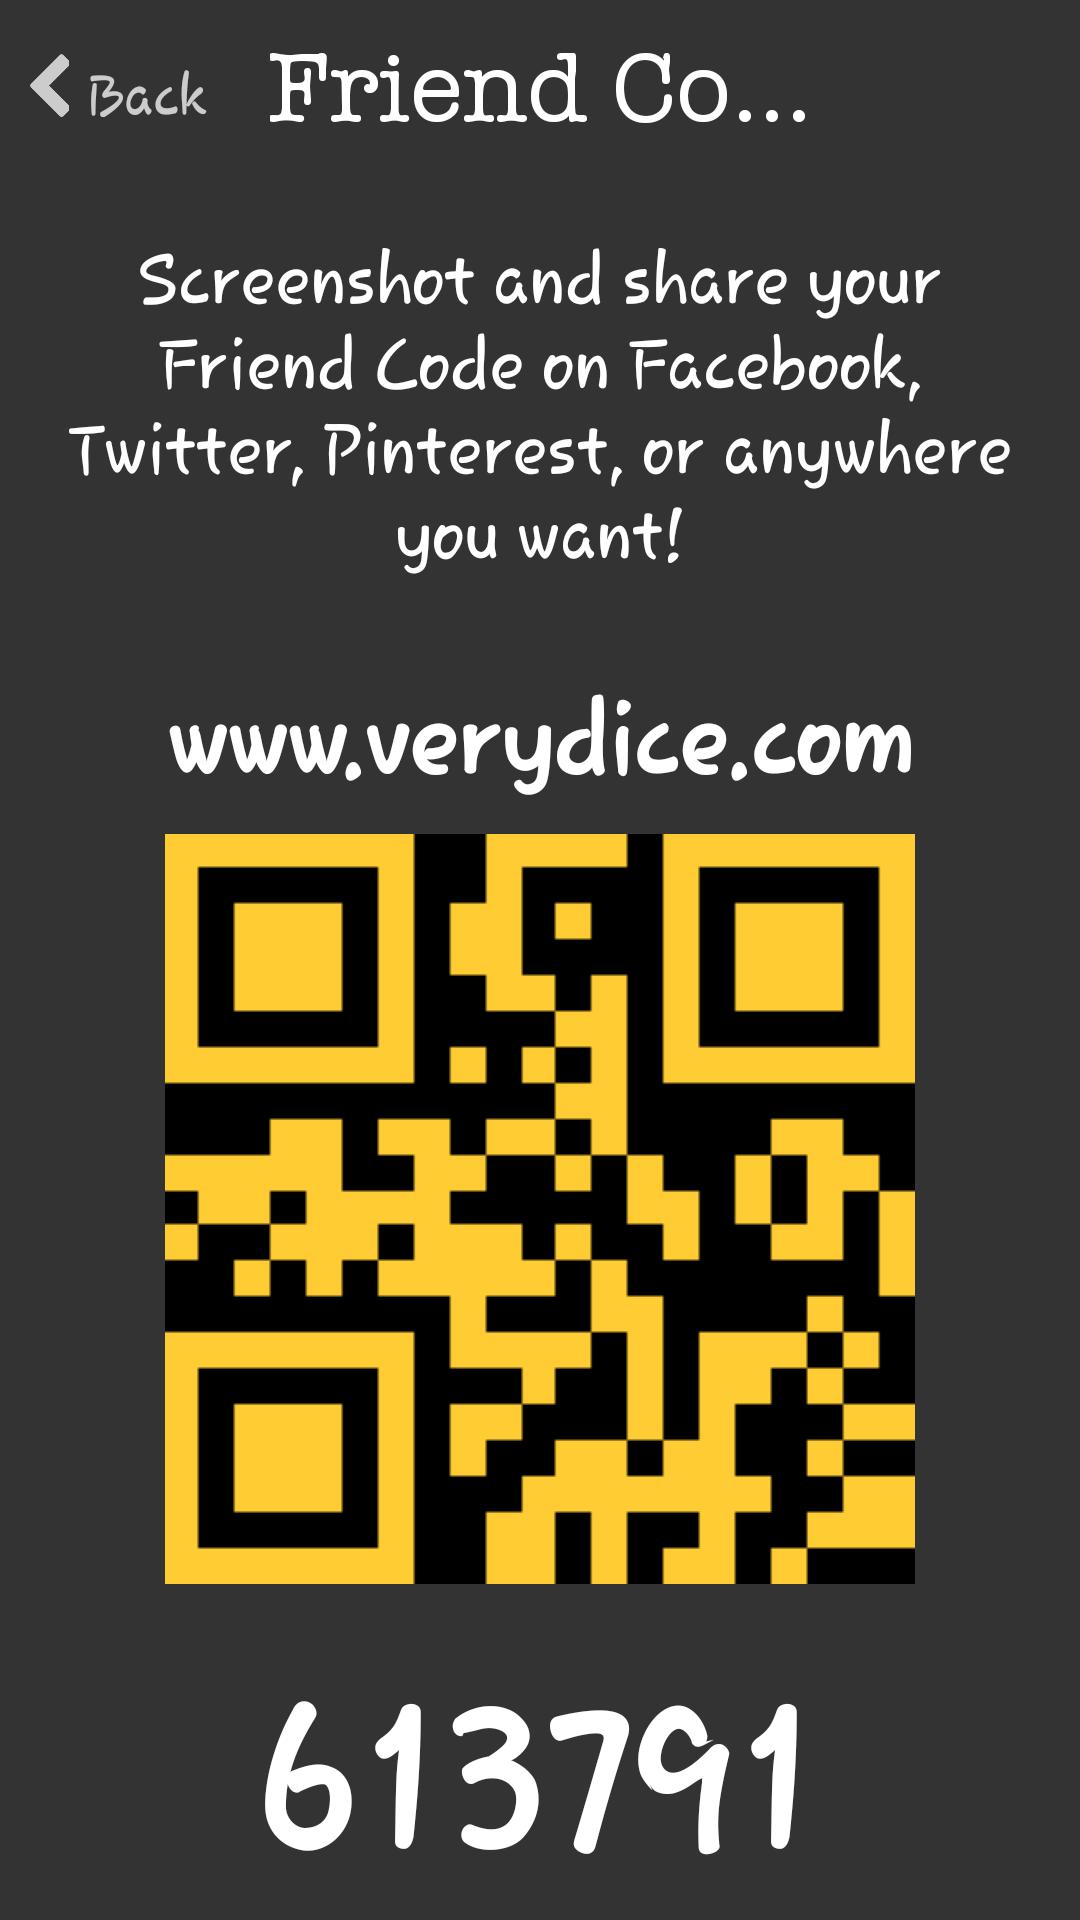 Pin by Gabriella Carranza on Verydice! Coding, Simple